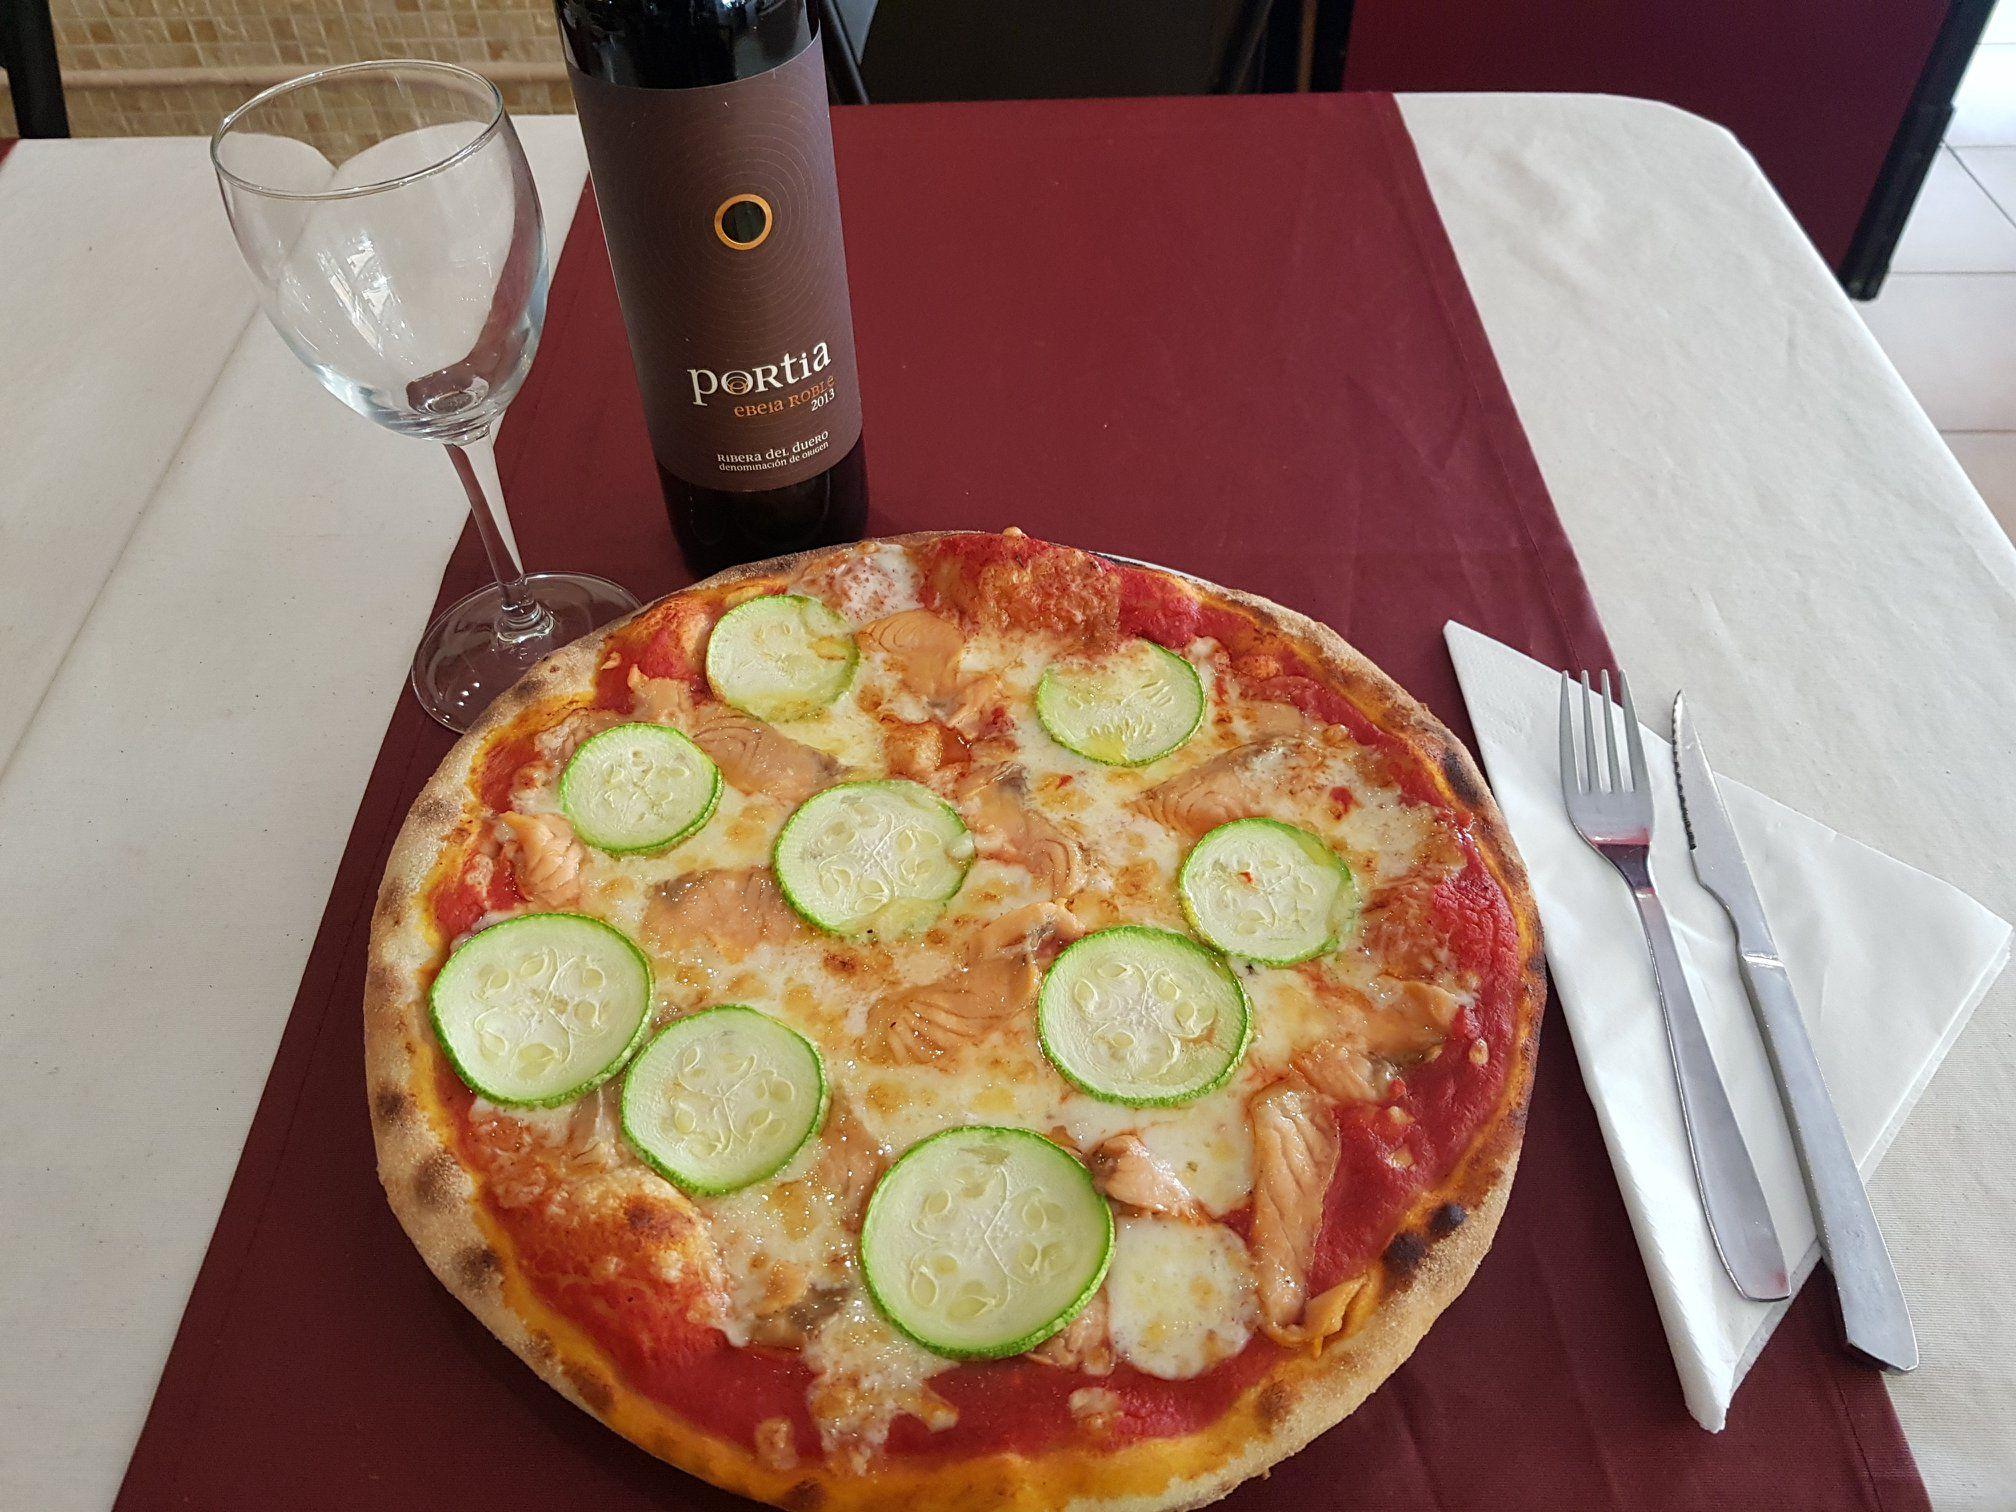 Prueba nuestra pizza mediterránea